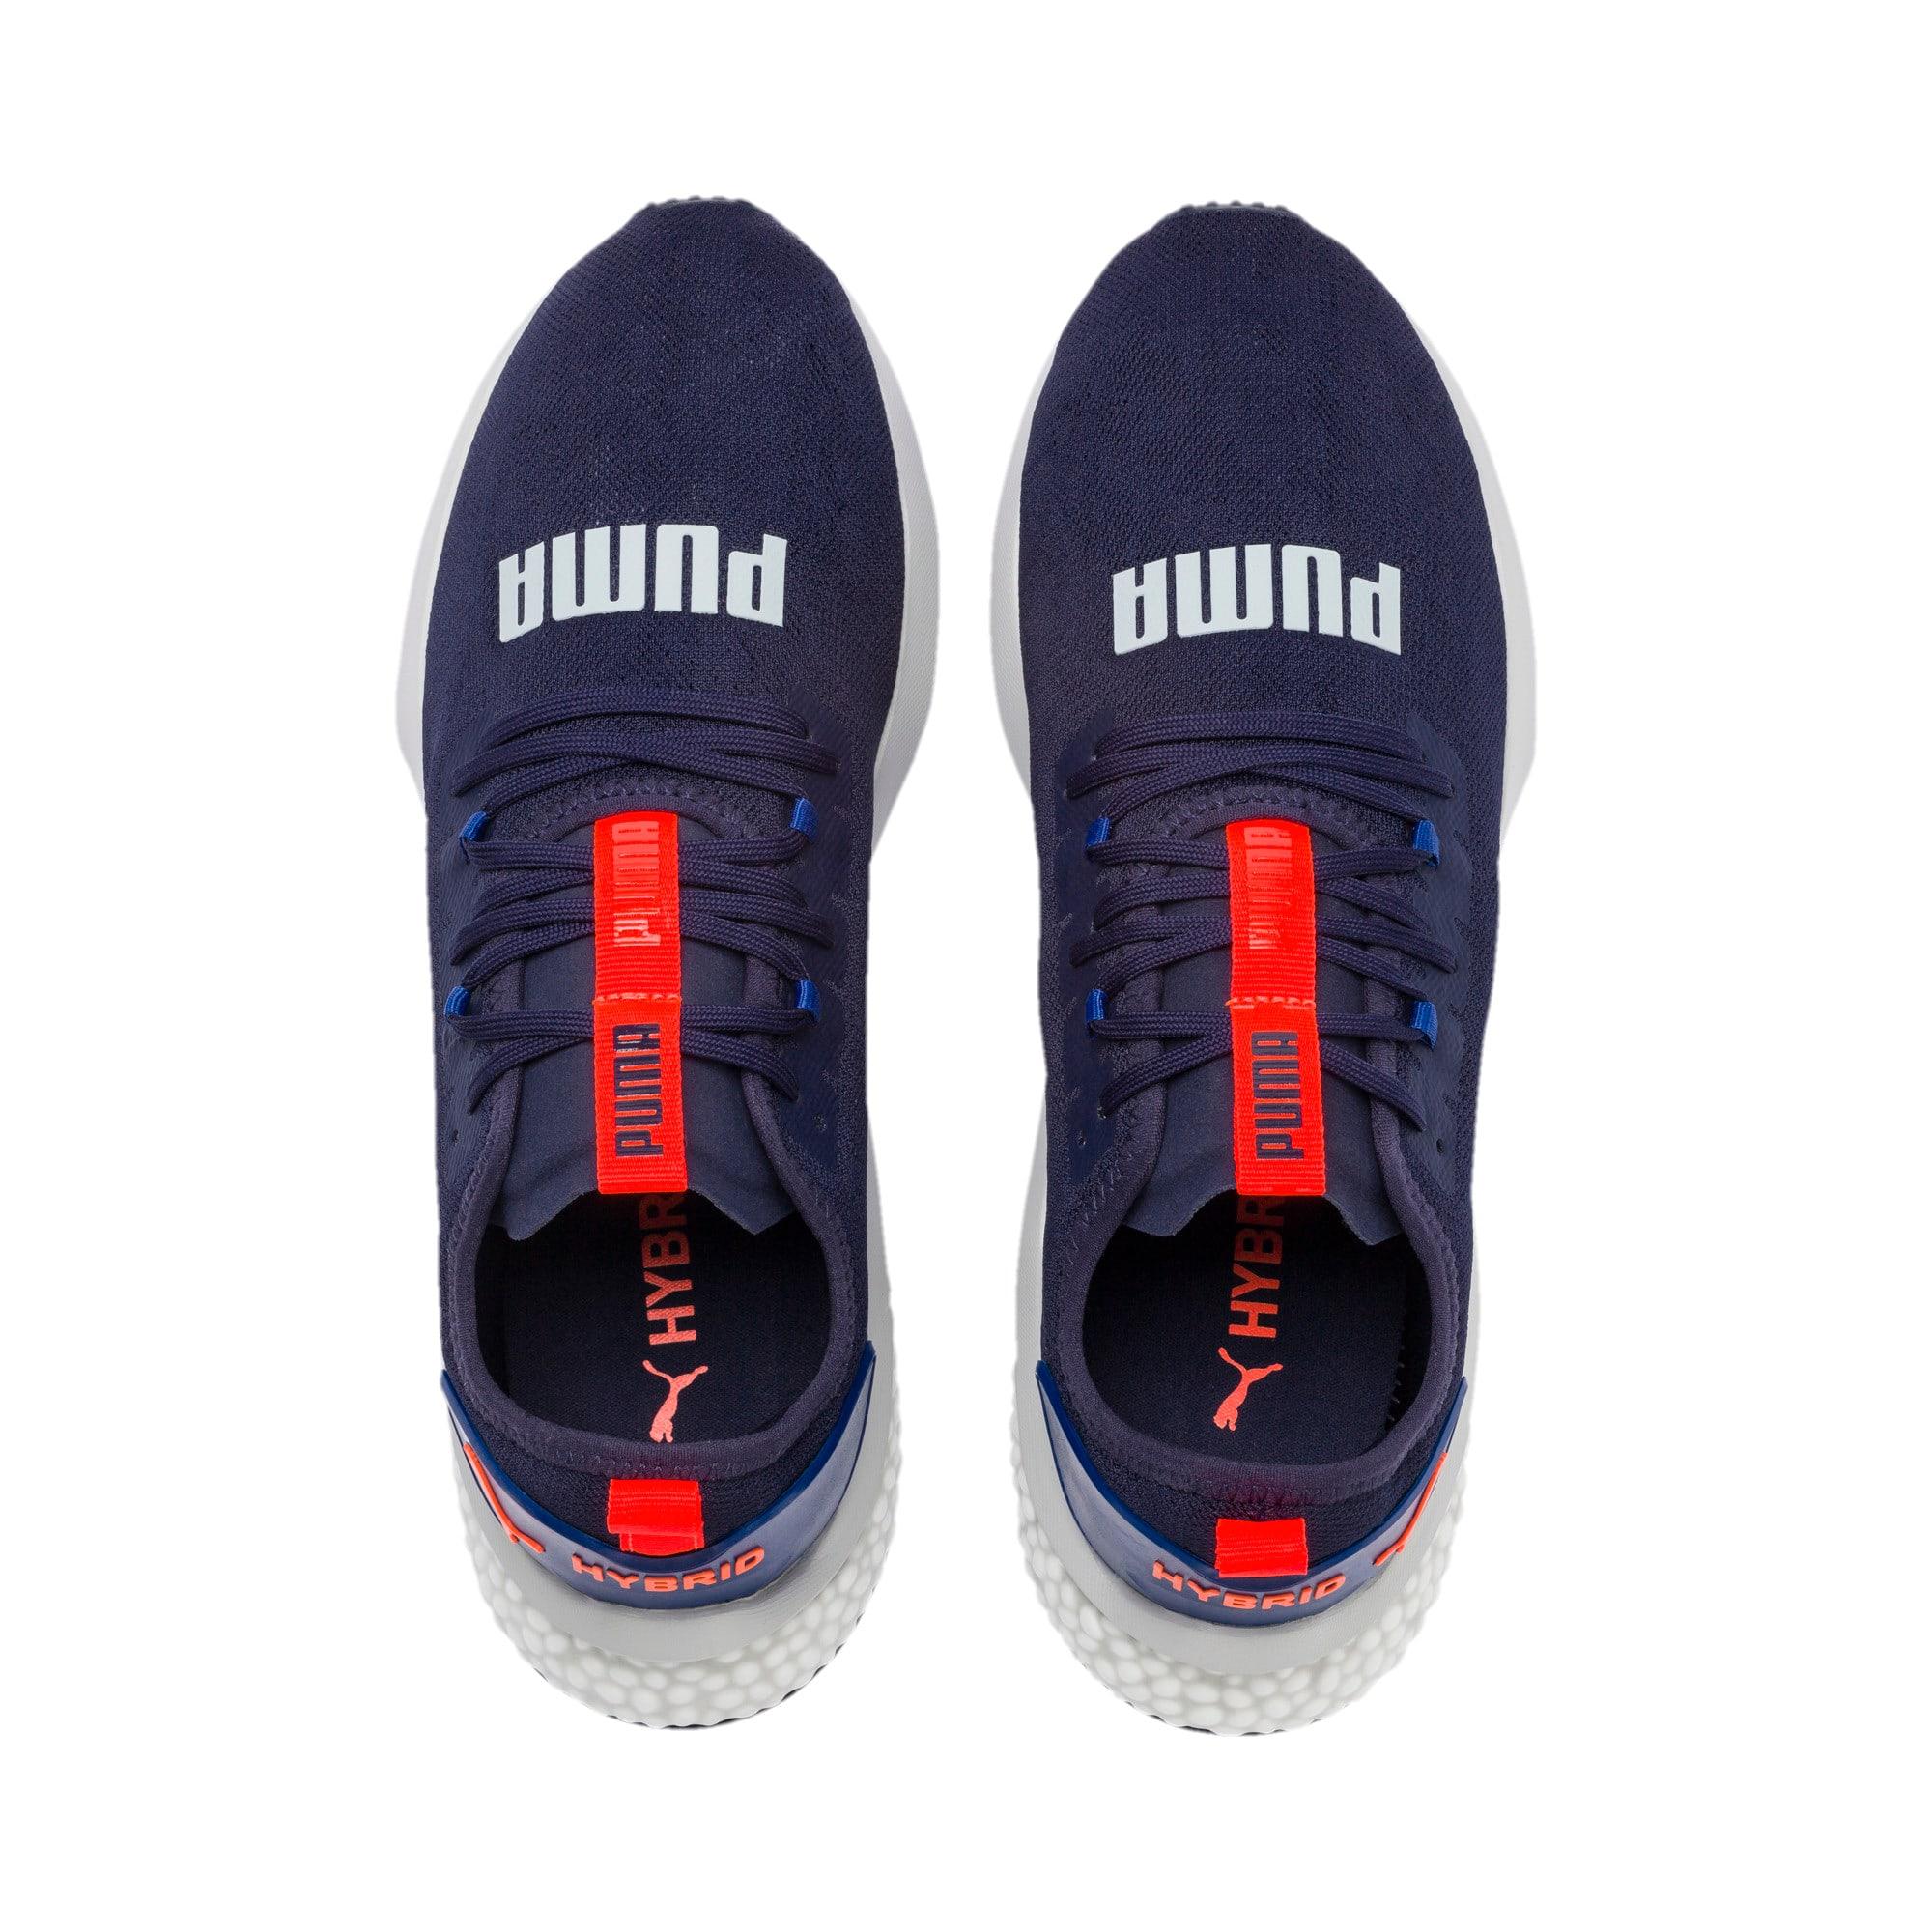 Thumbnail 7 of HYBRID NX Camo Men's Running Shoes, GalaxyBlue-Peacoat-HighRise, medium